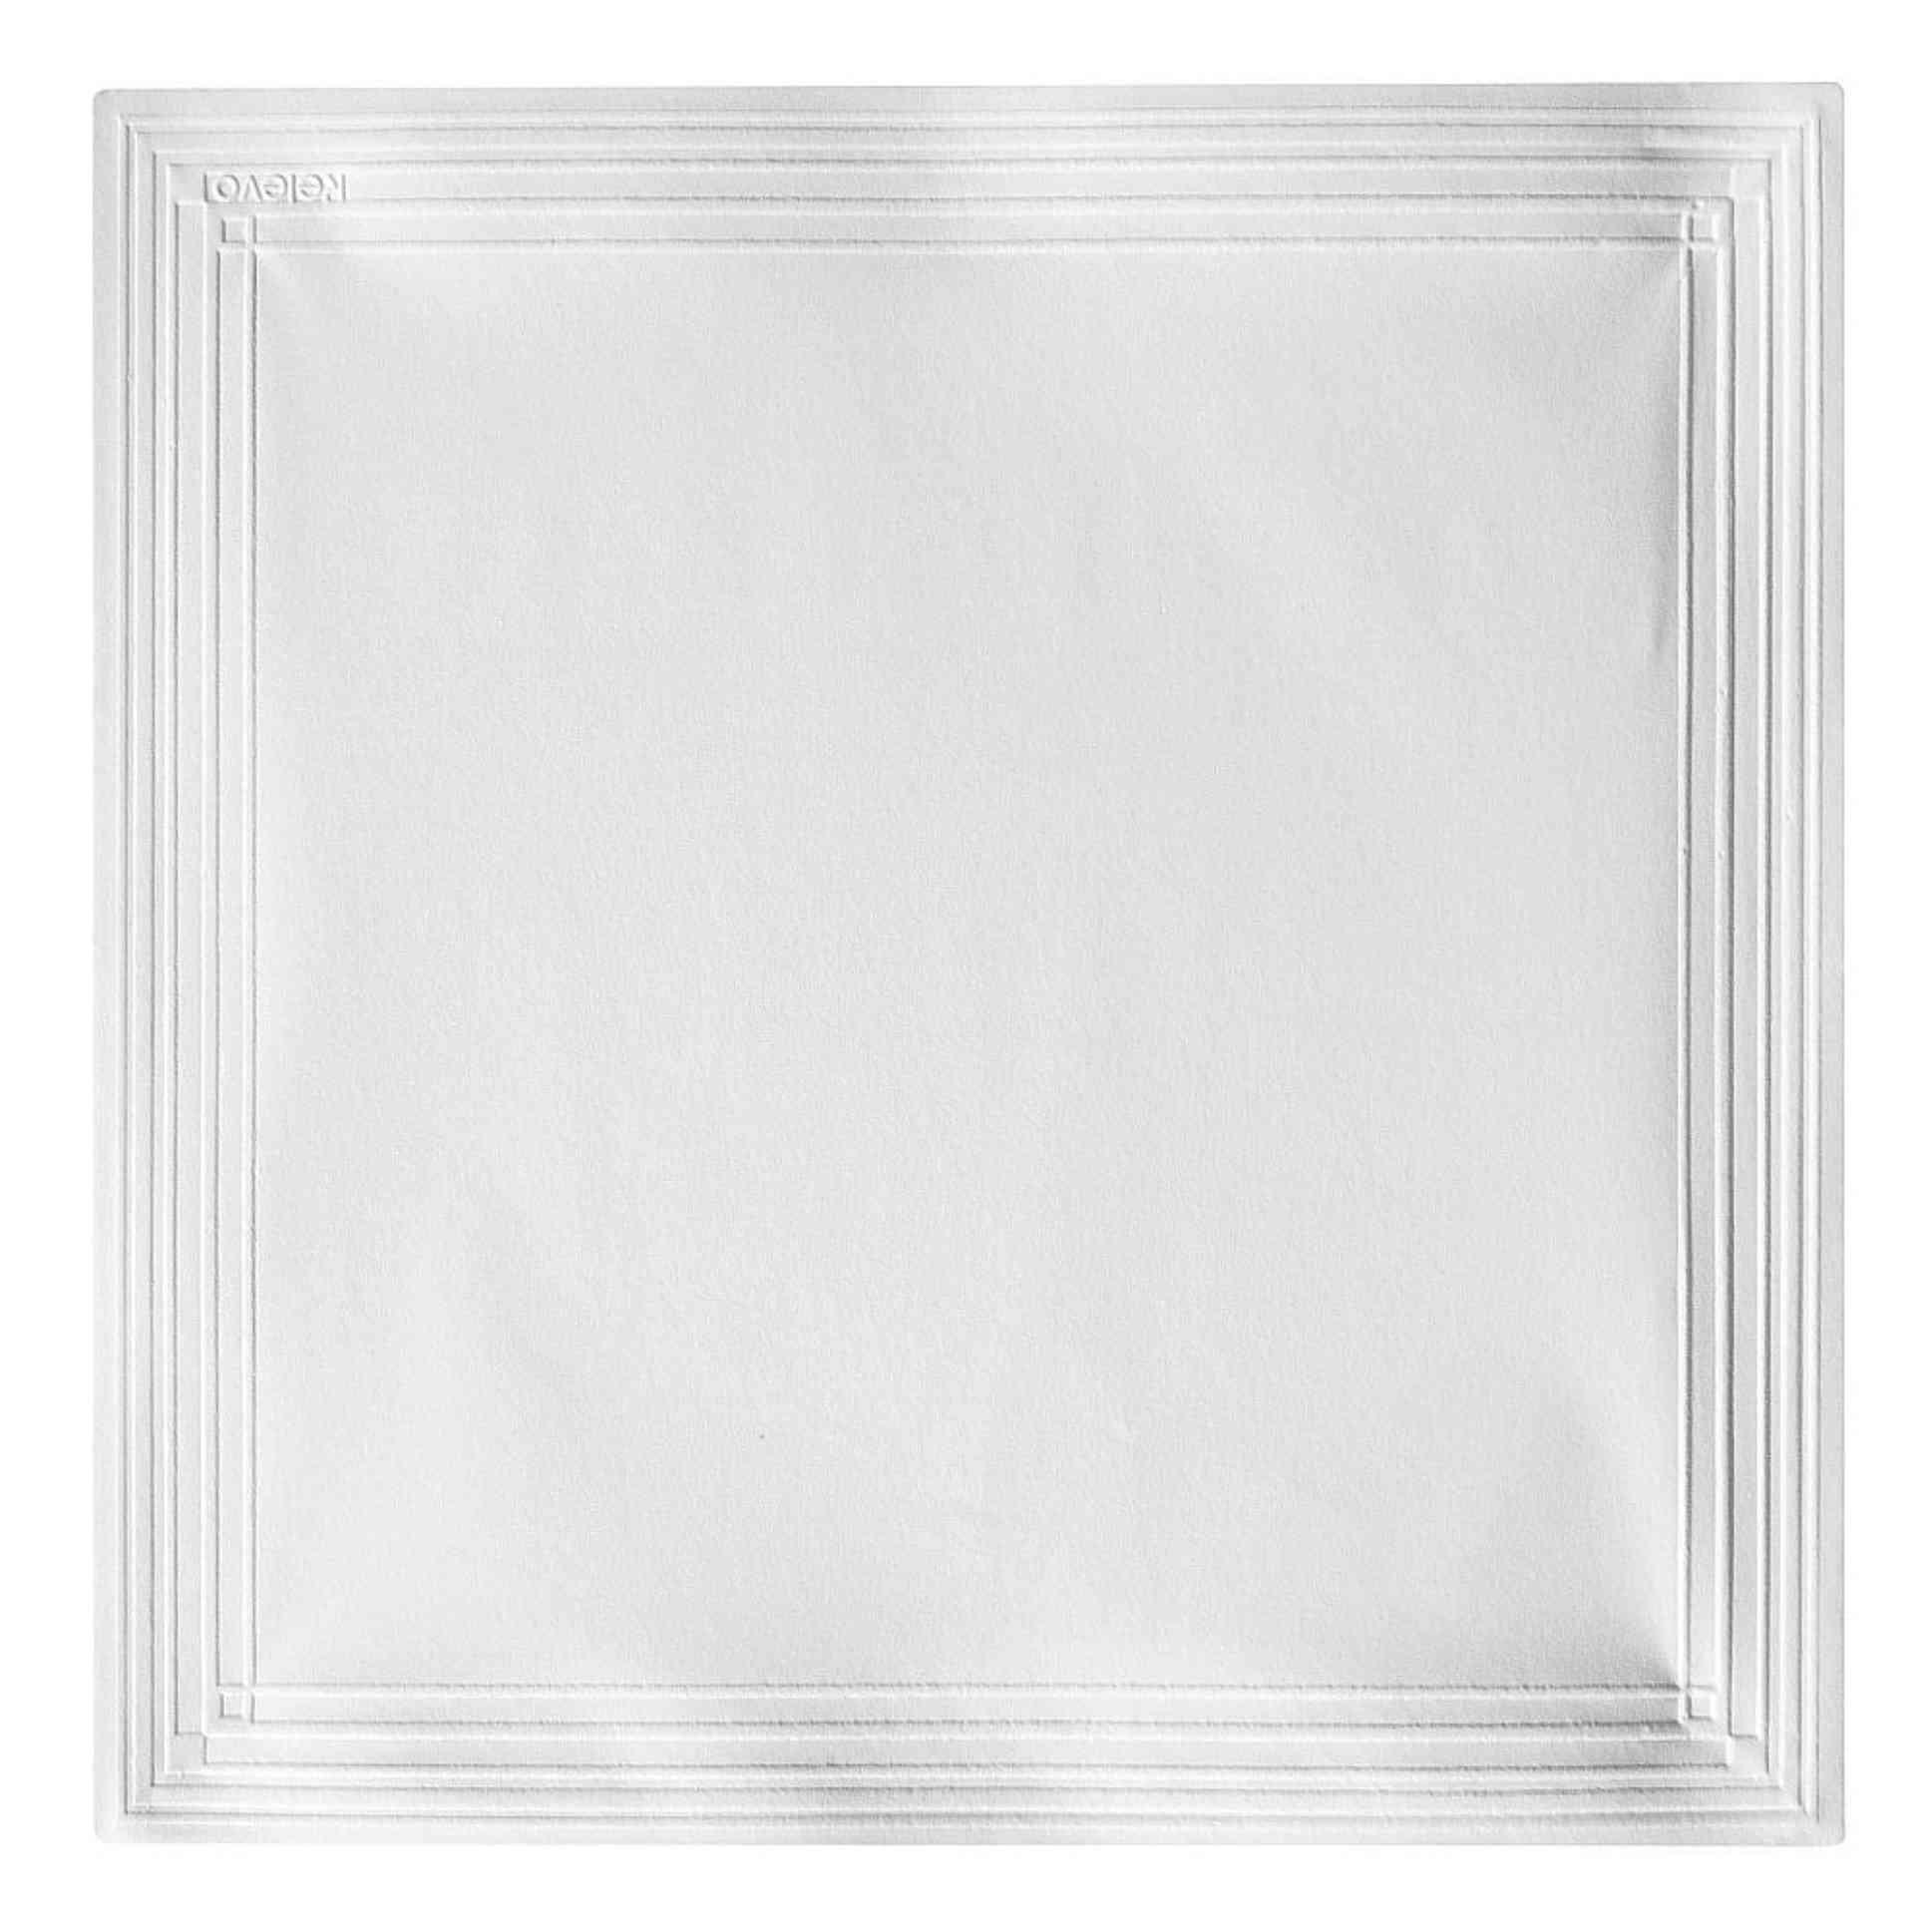 Guardanapo papel coquetel branco liso/Clássico 20x20 - 100 unid  - Persona Guardanapos & Cia